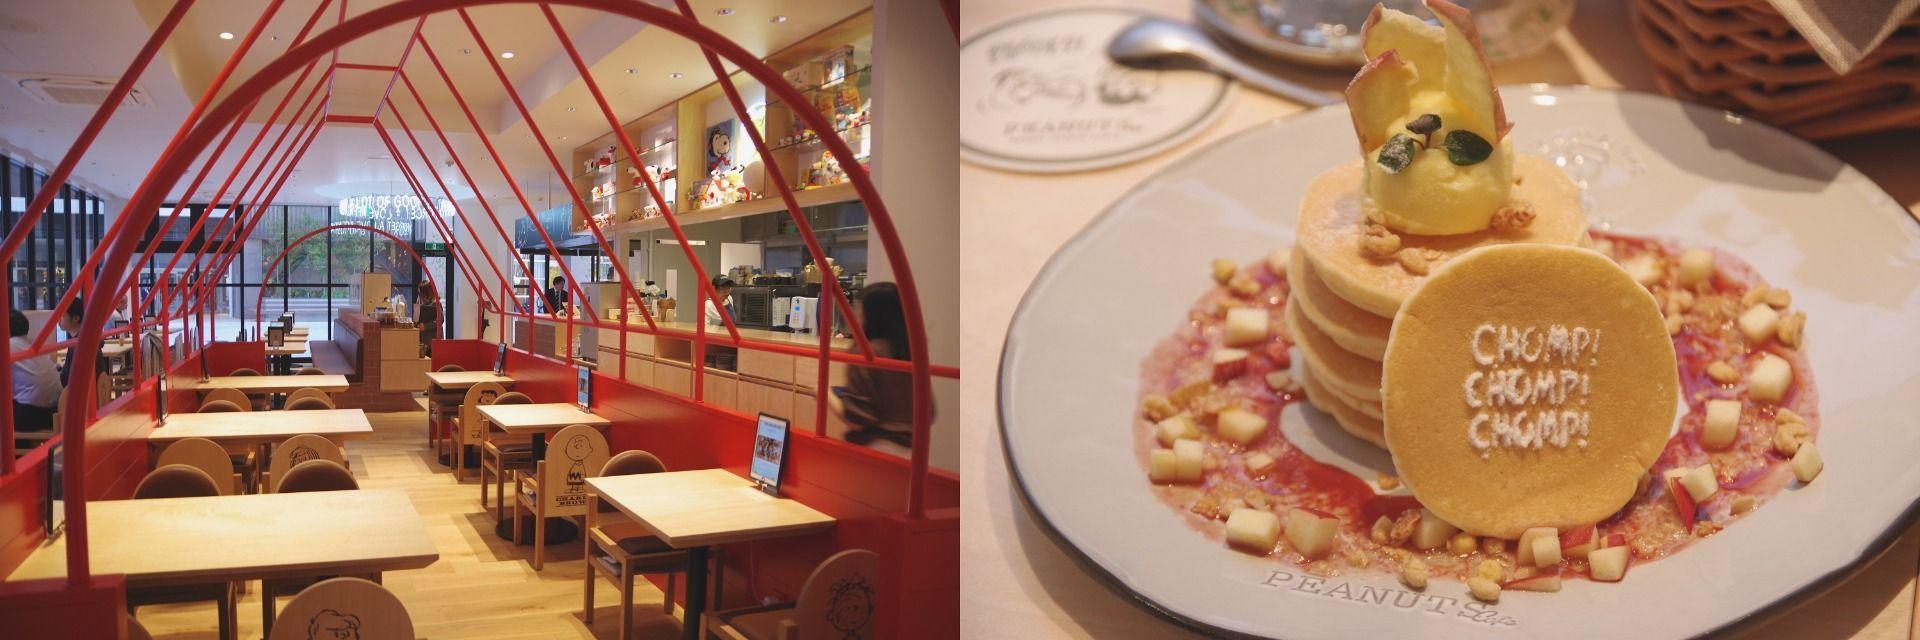 "Minami-machida Grandberry Park- from Cinemas, Famous Restaurants to Mascot Specialties ""Snoopy Museum"